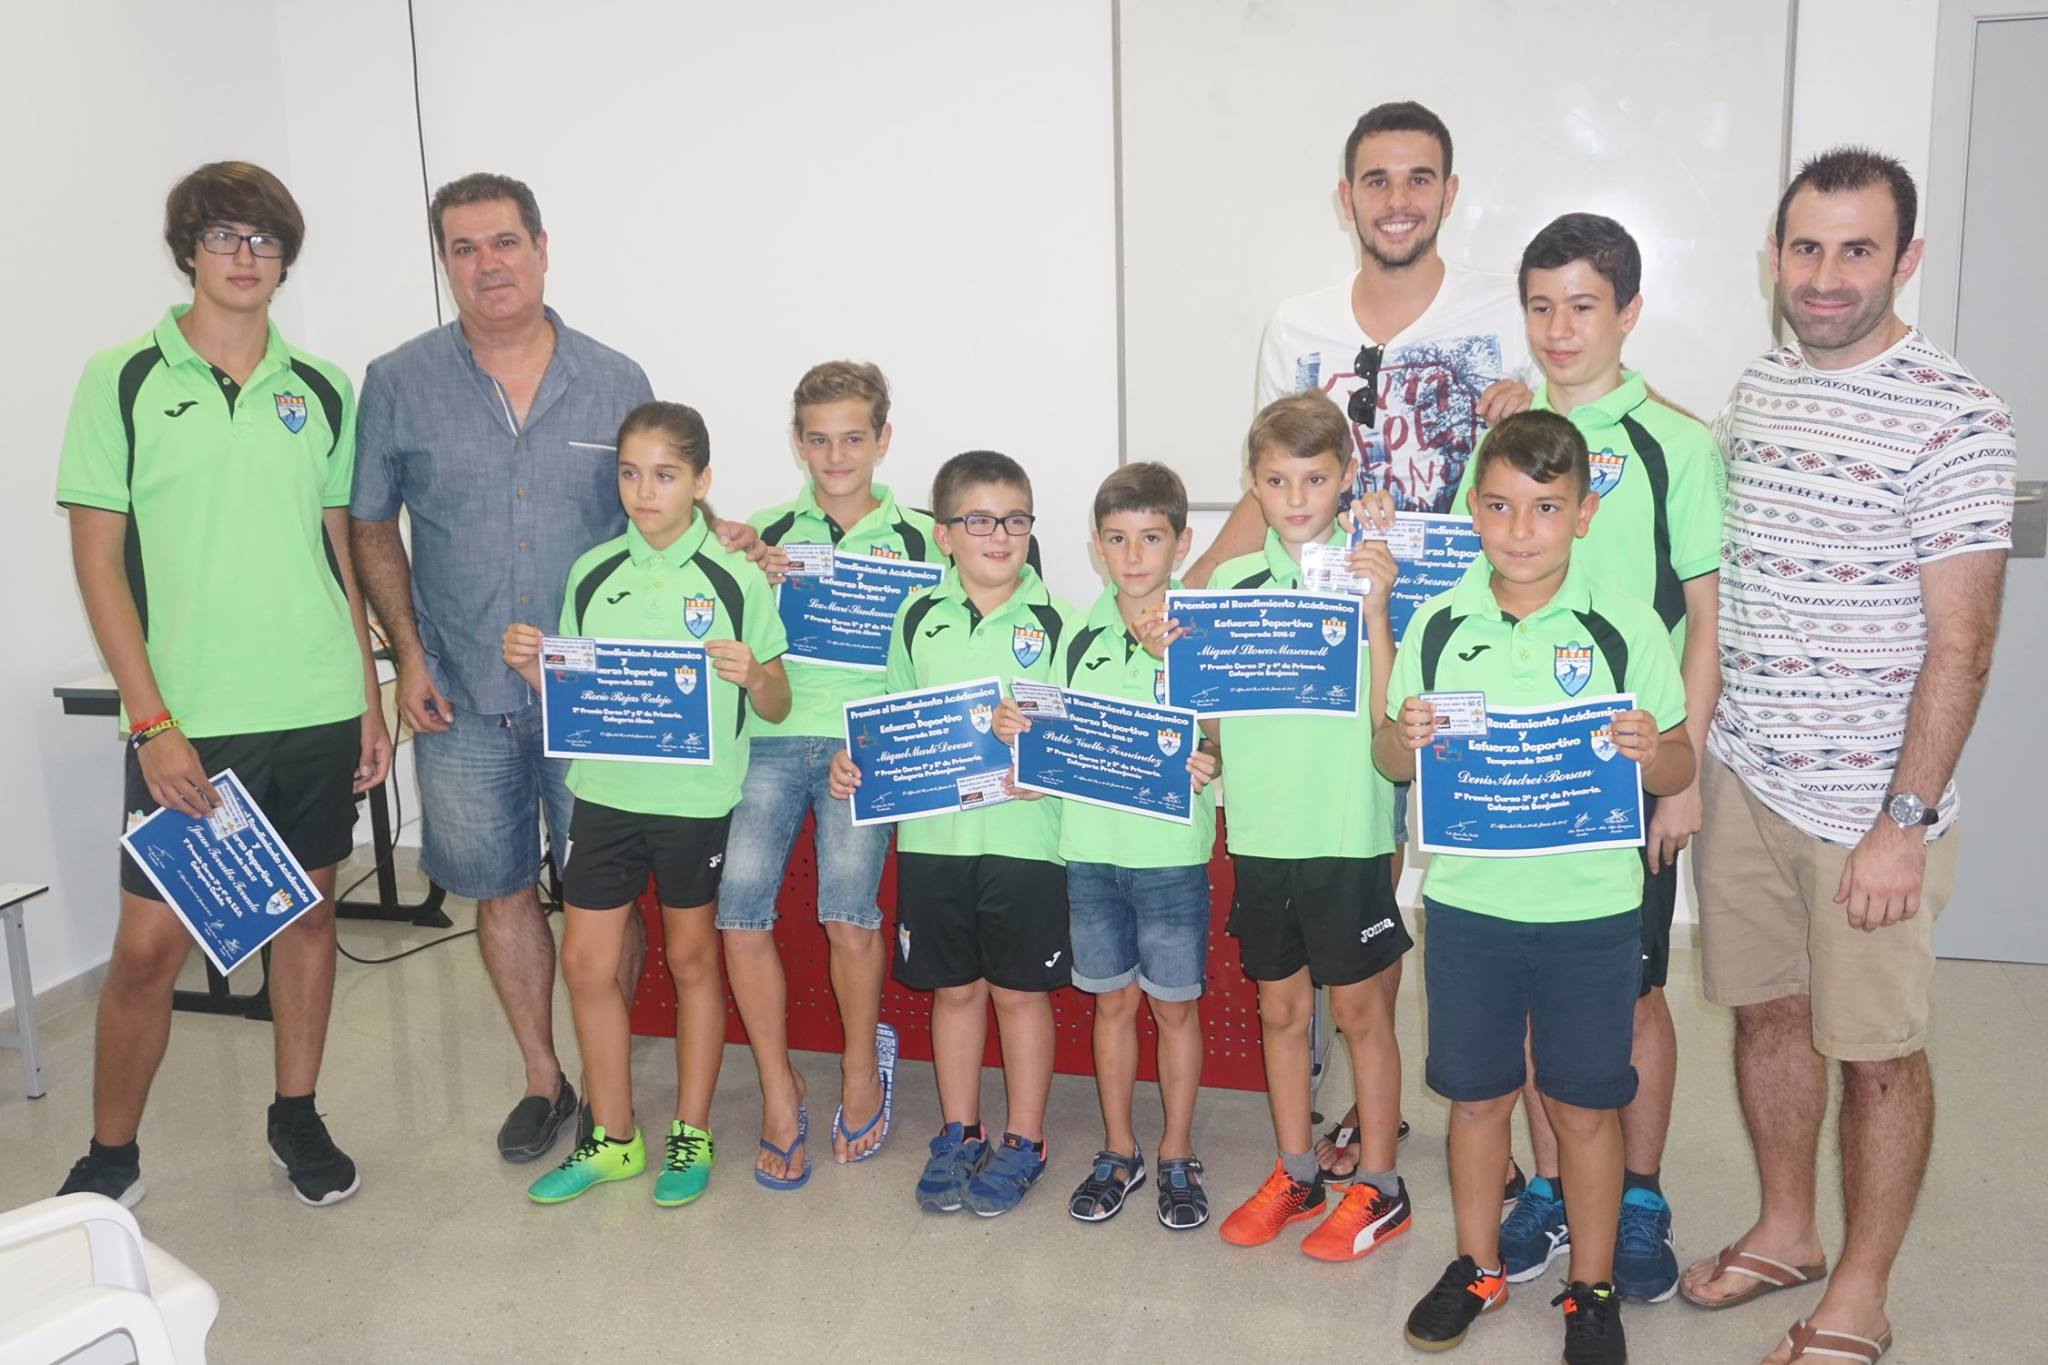 El CFS de l'Alfàs premia a los mejores jugadores y estudiantes.